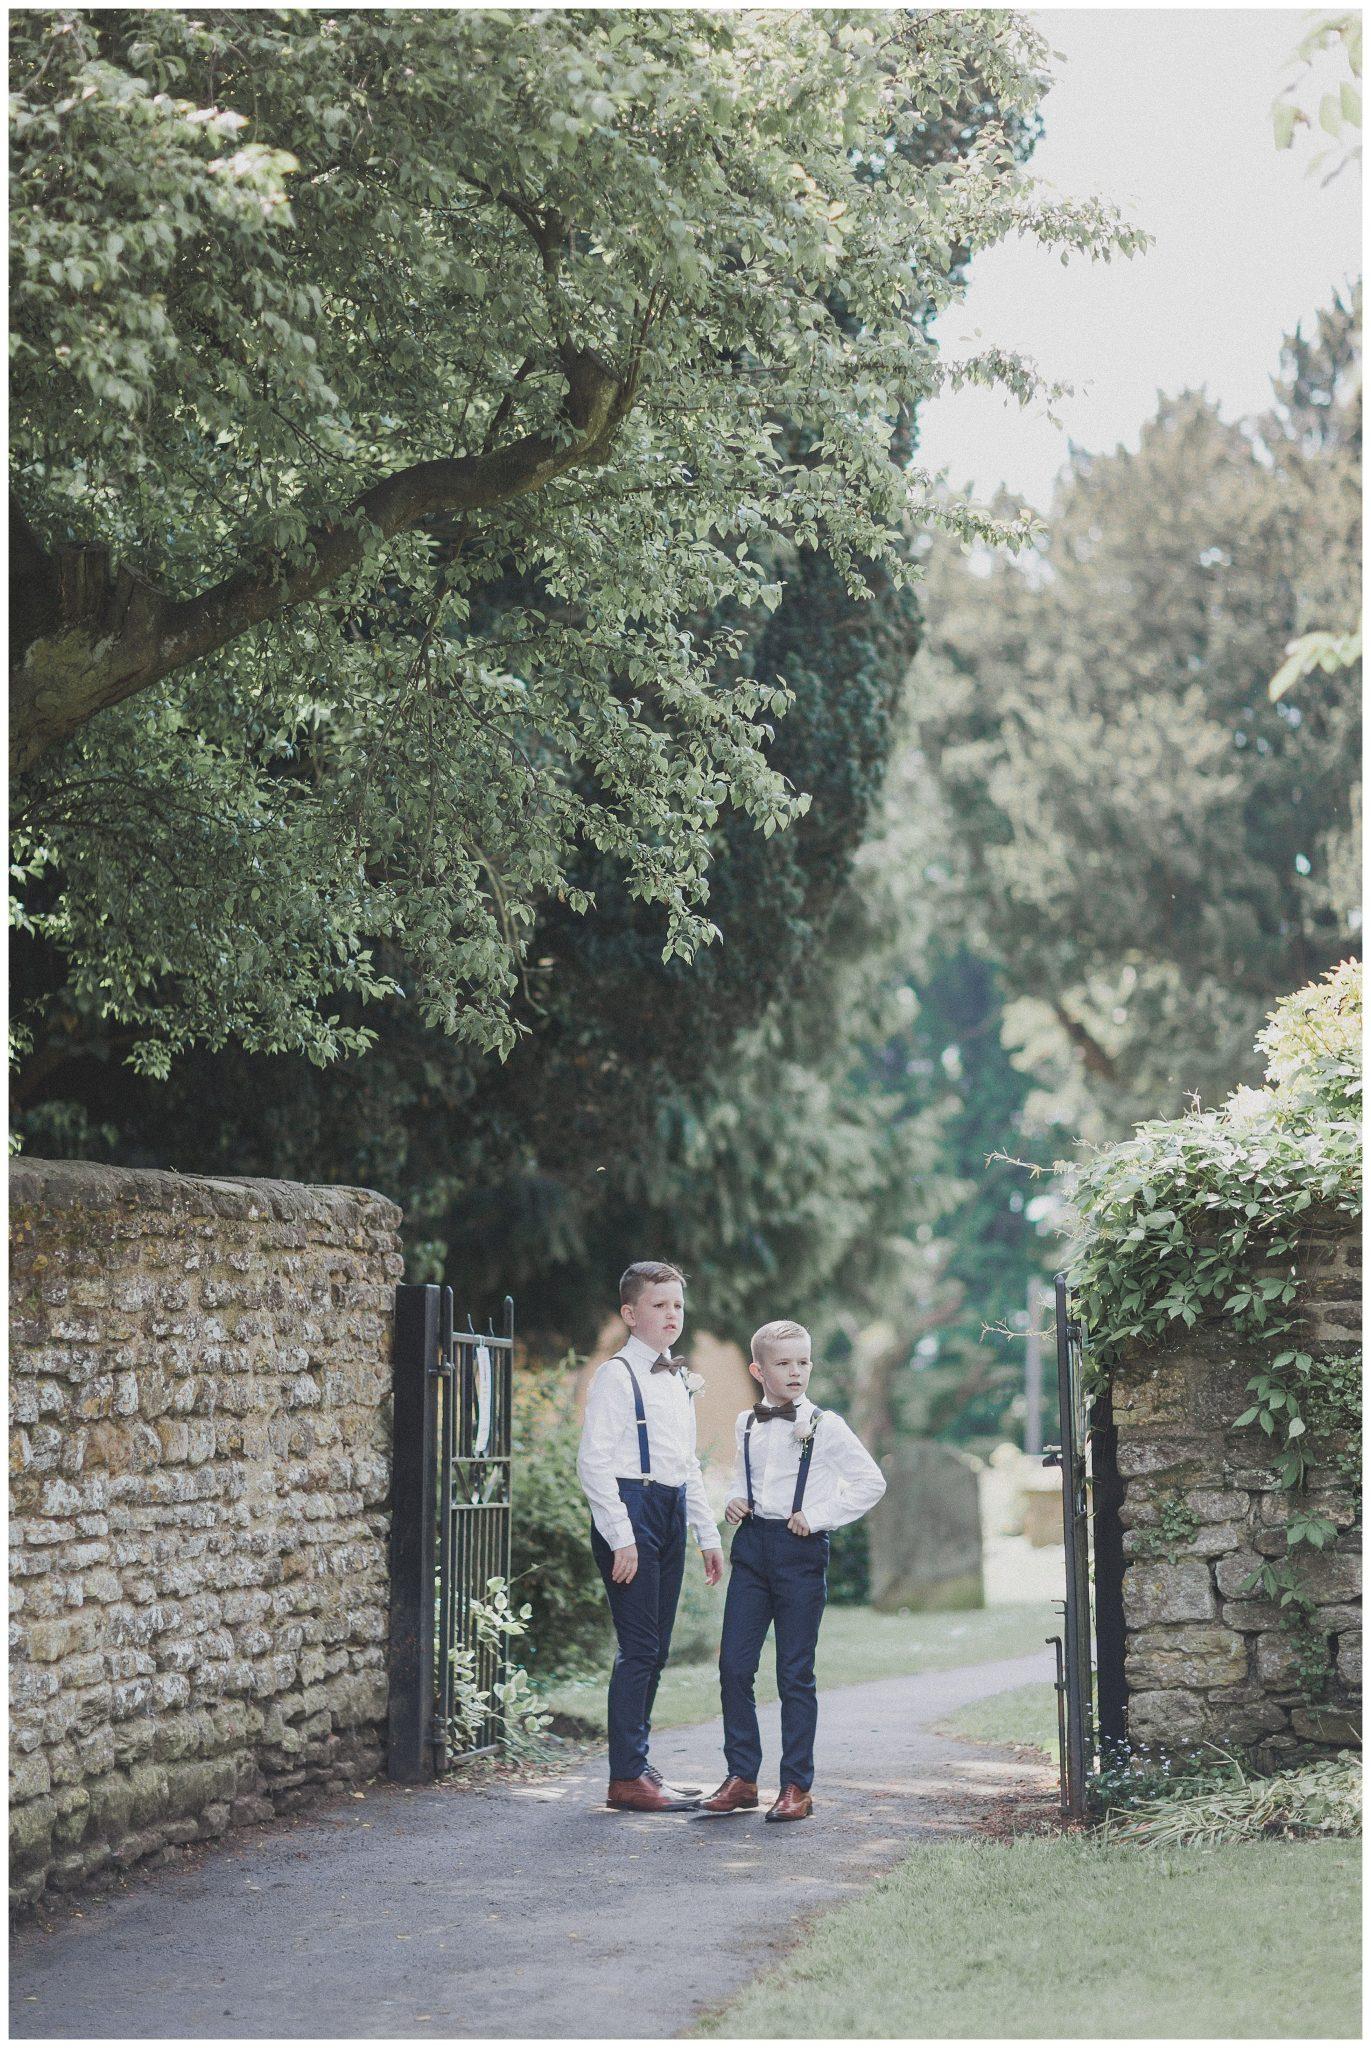 The boys waiting at the church gate